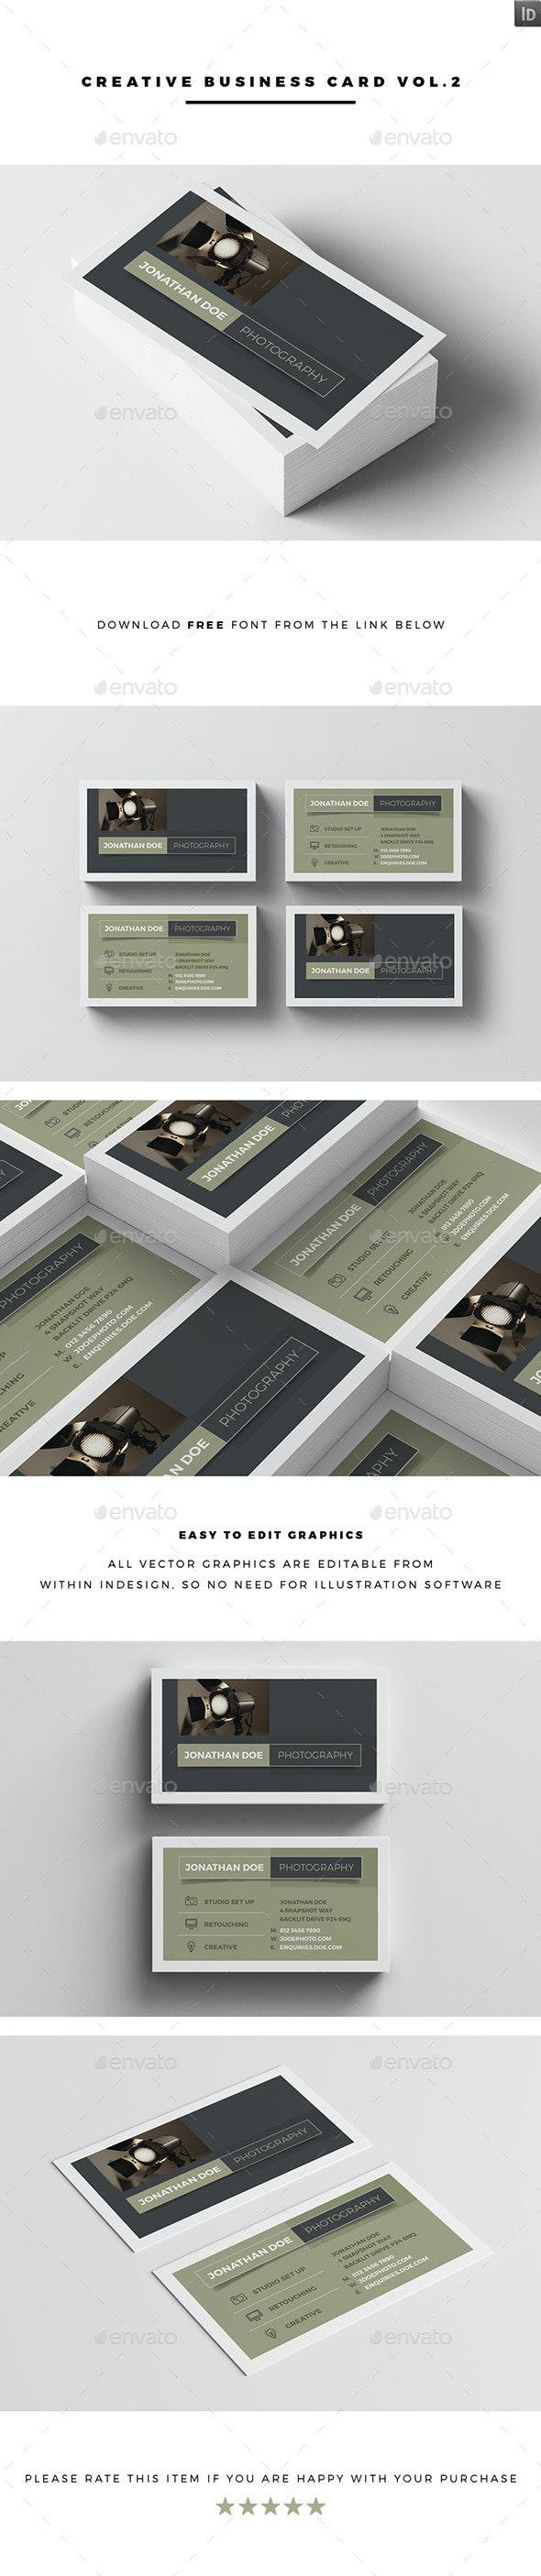 Creative Business Card Vol.3 - Creative Business Cards